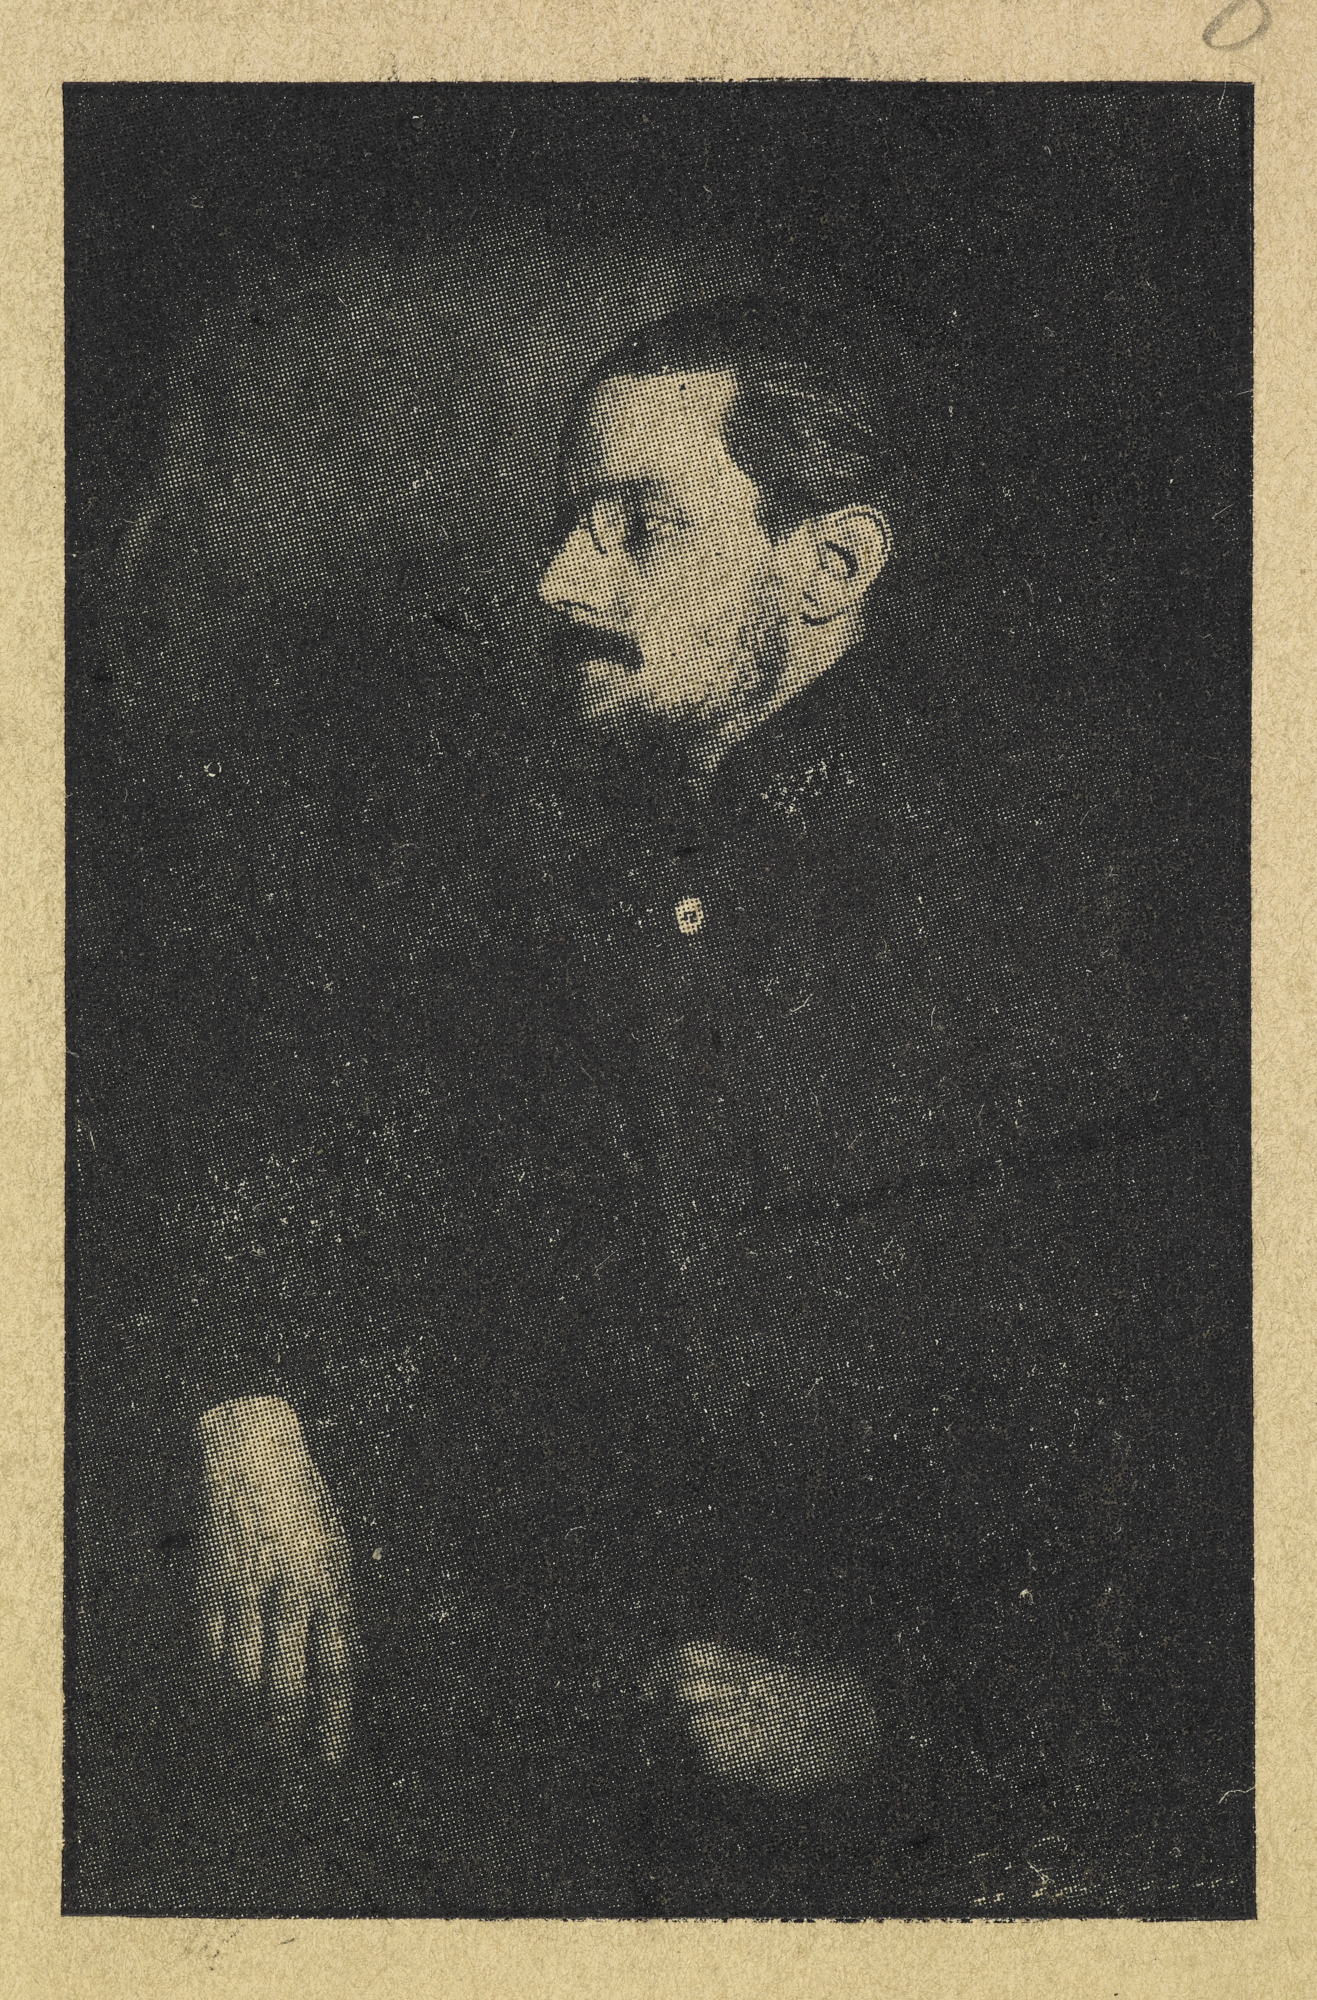 "Portrait of James Joyce by unknown photographer. <a href=""http://creativecommons.org/publicdomain/mark/1.0/"">Public Domain</a>."